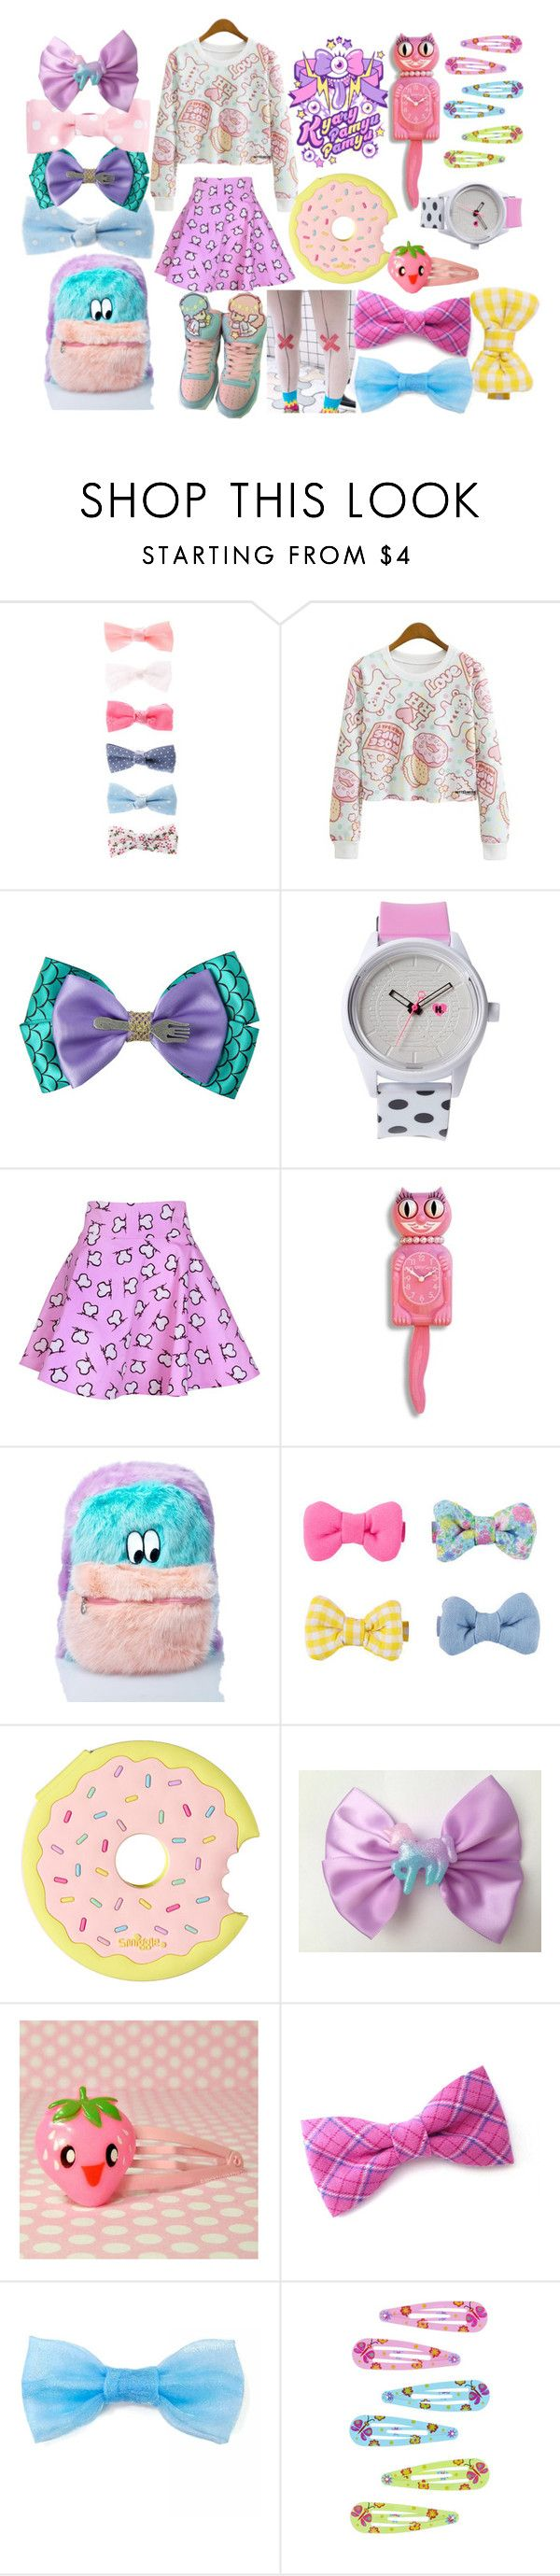 """Harajuku Decora"" by drhumanguy ❤ liked on Polyvore featuring Disney, Harajuku Lovers, Jeremy Scott, Lazy Oaf, cute, japanese, harajuku and decora"